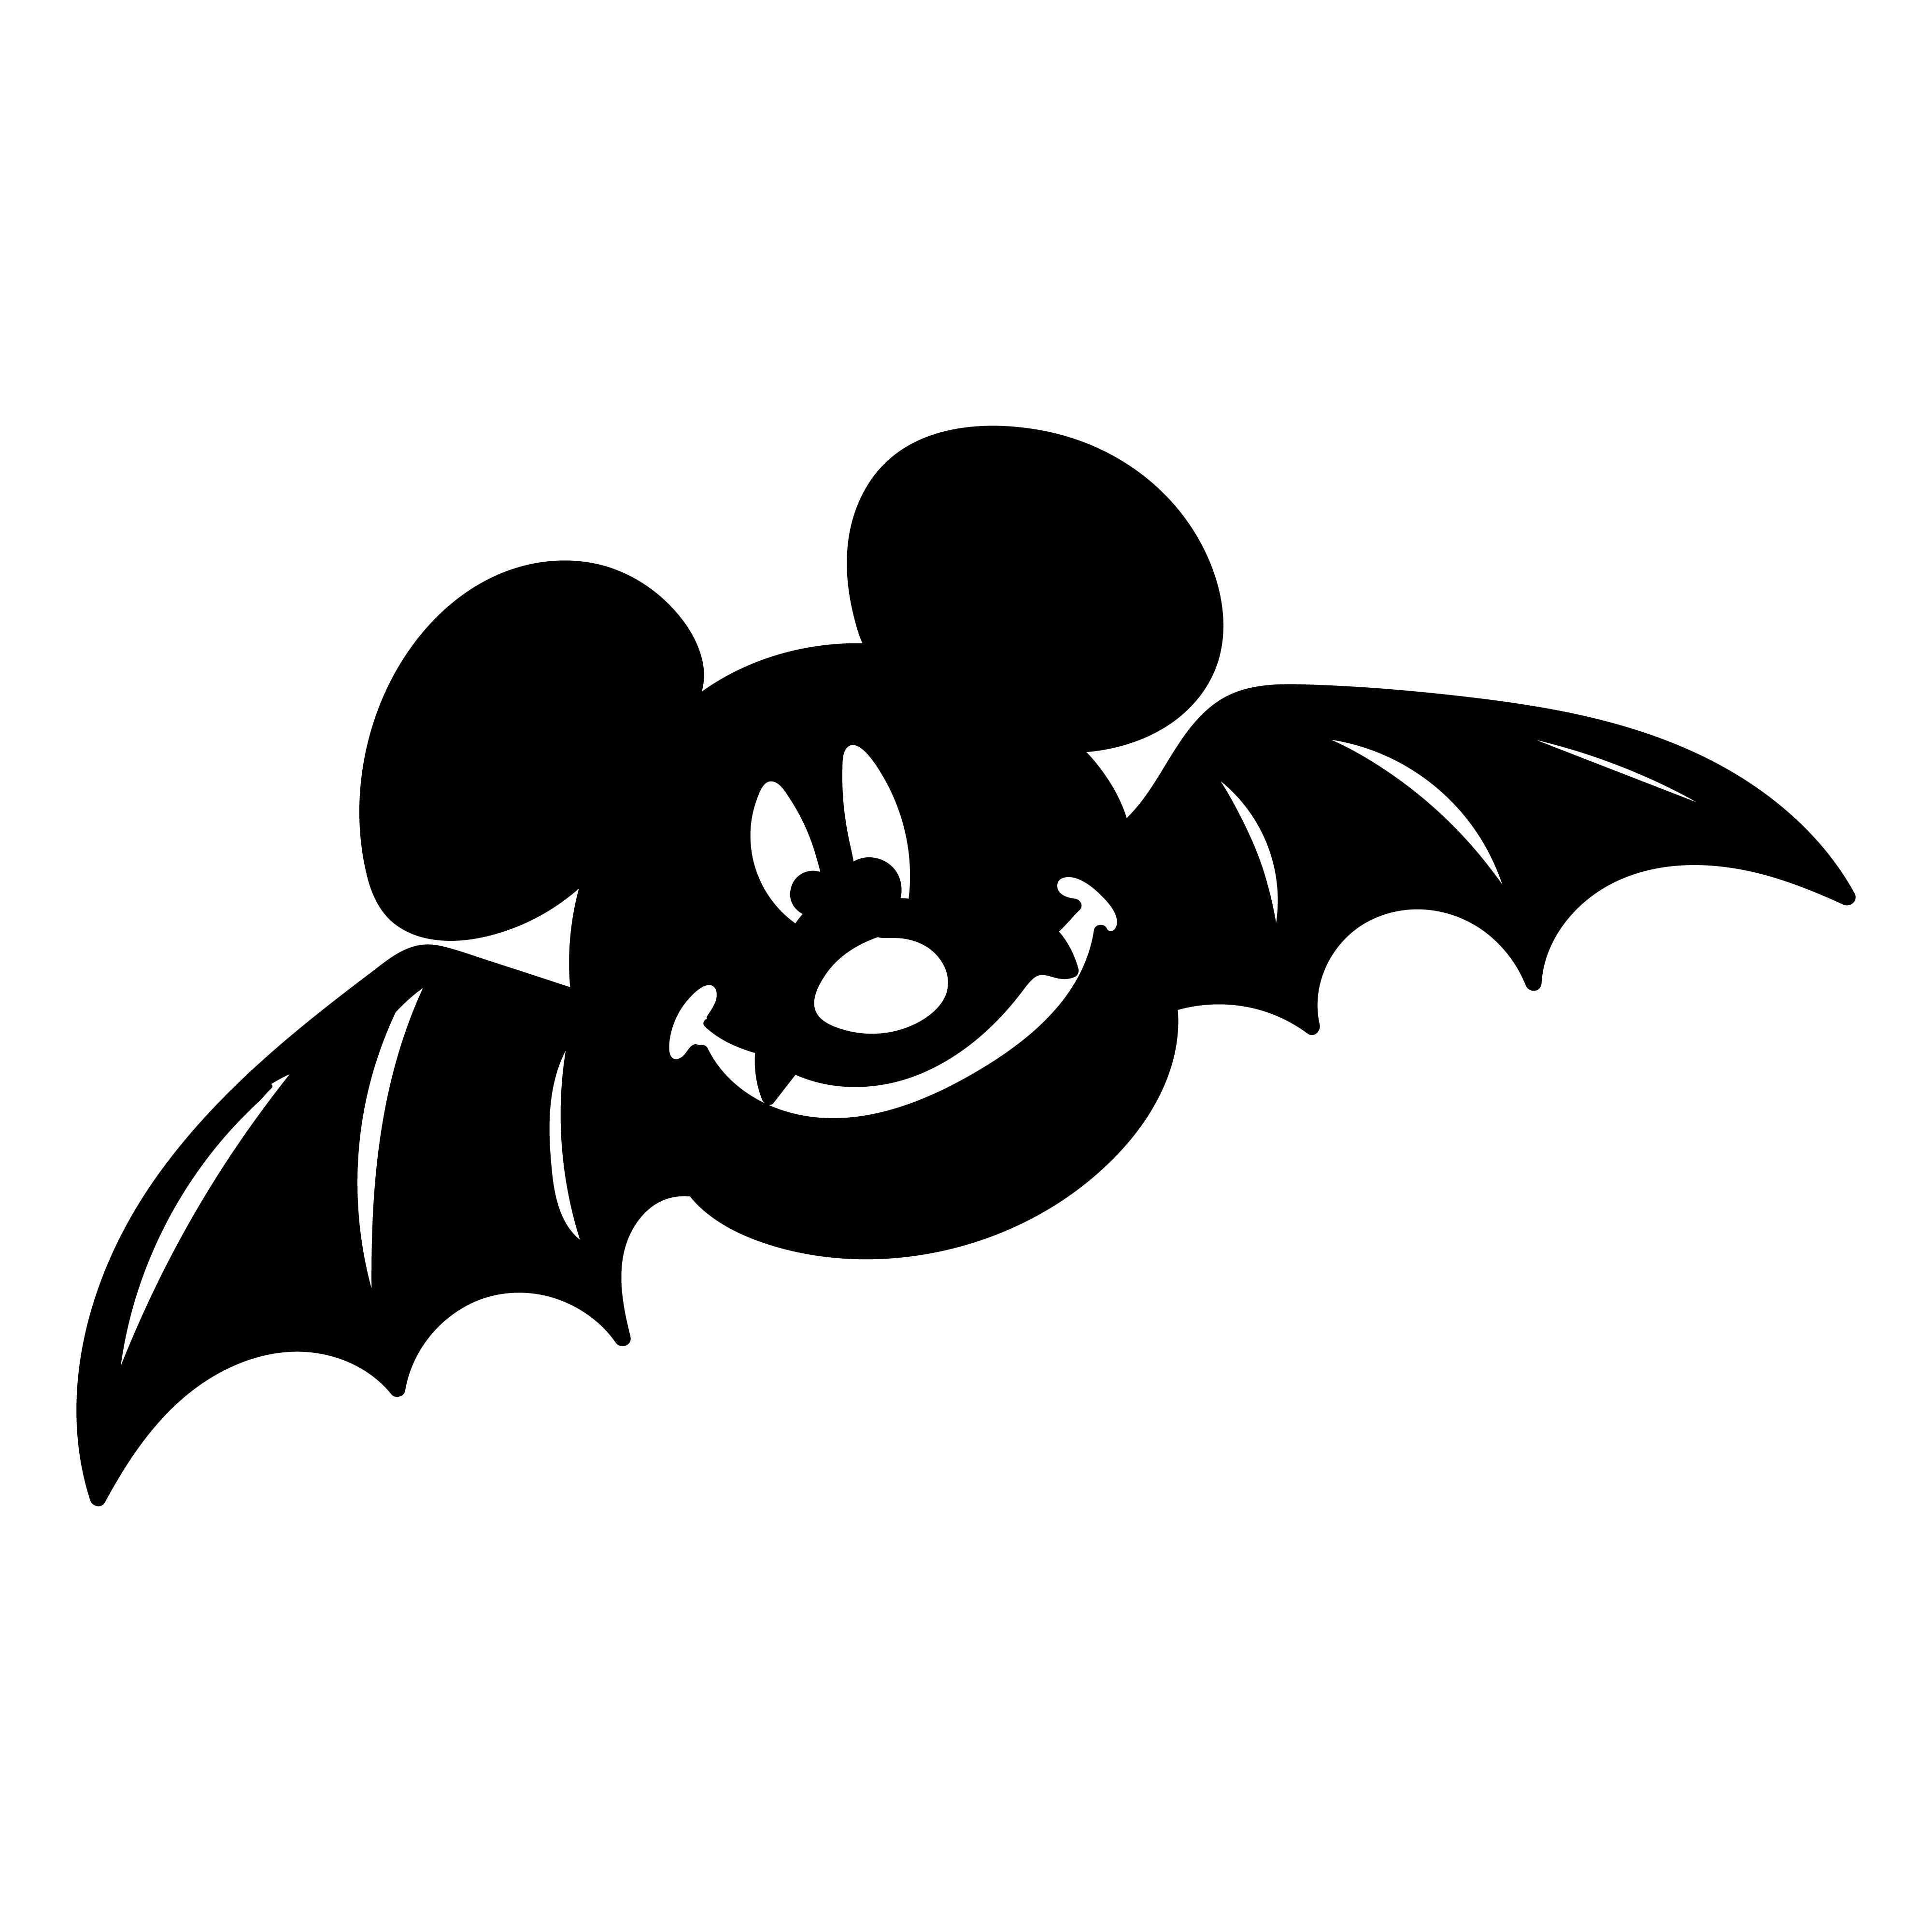 5 Images of Disney Halloween Pumpkin Stencils Free Printable